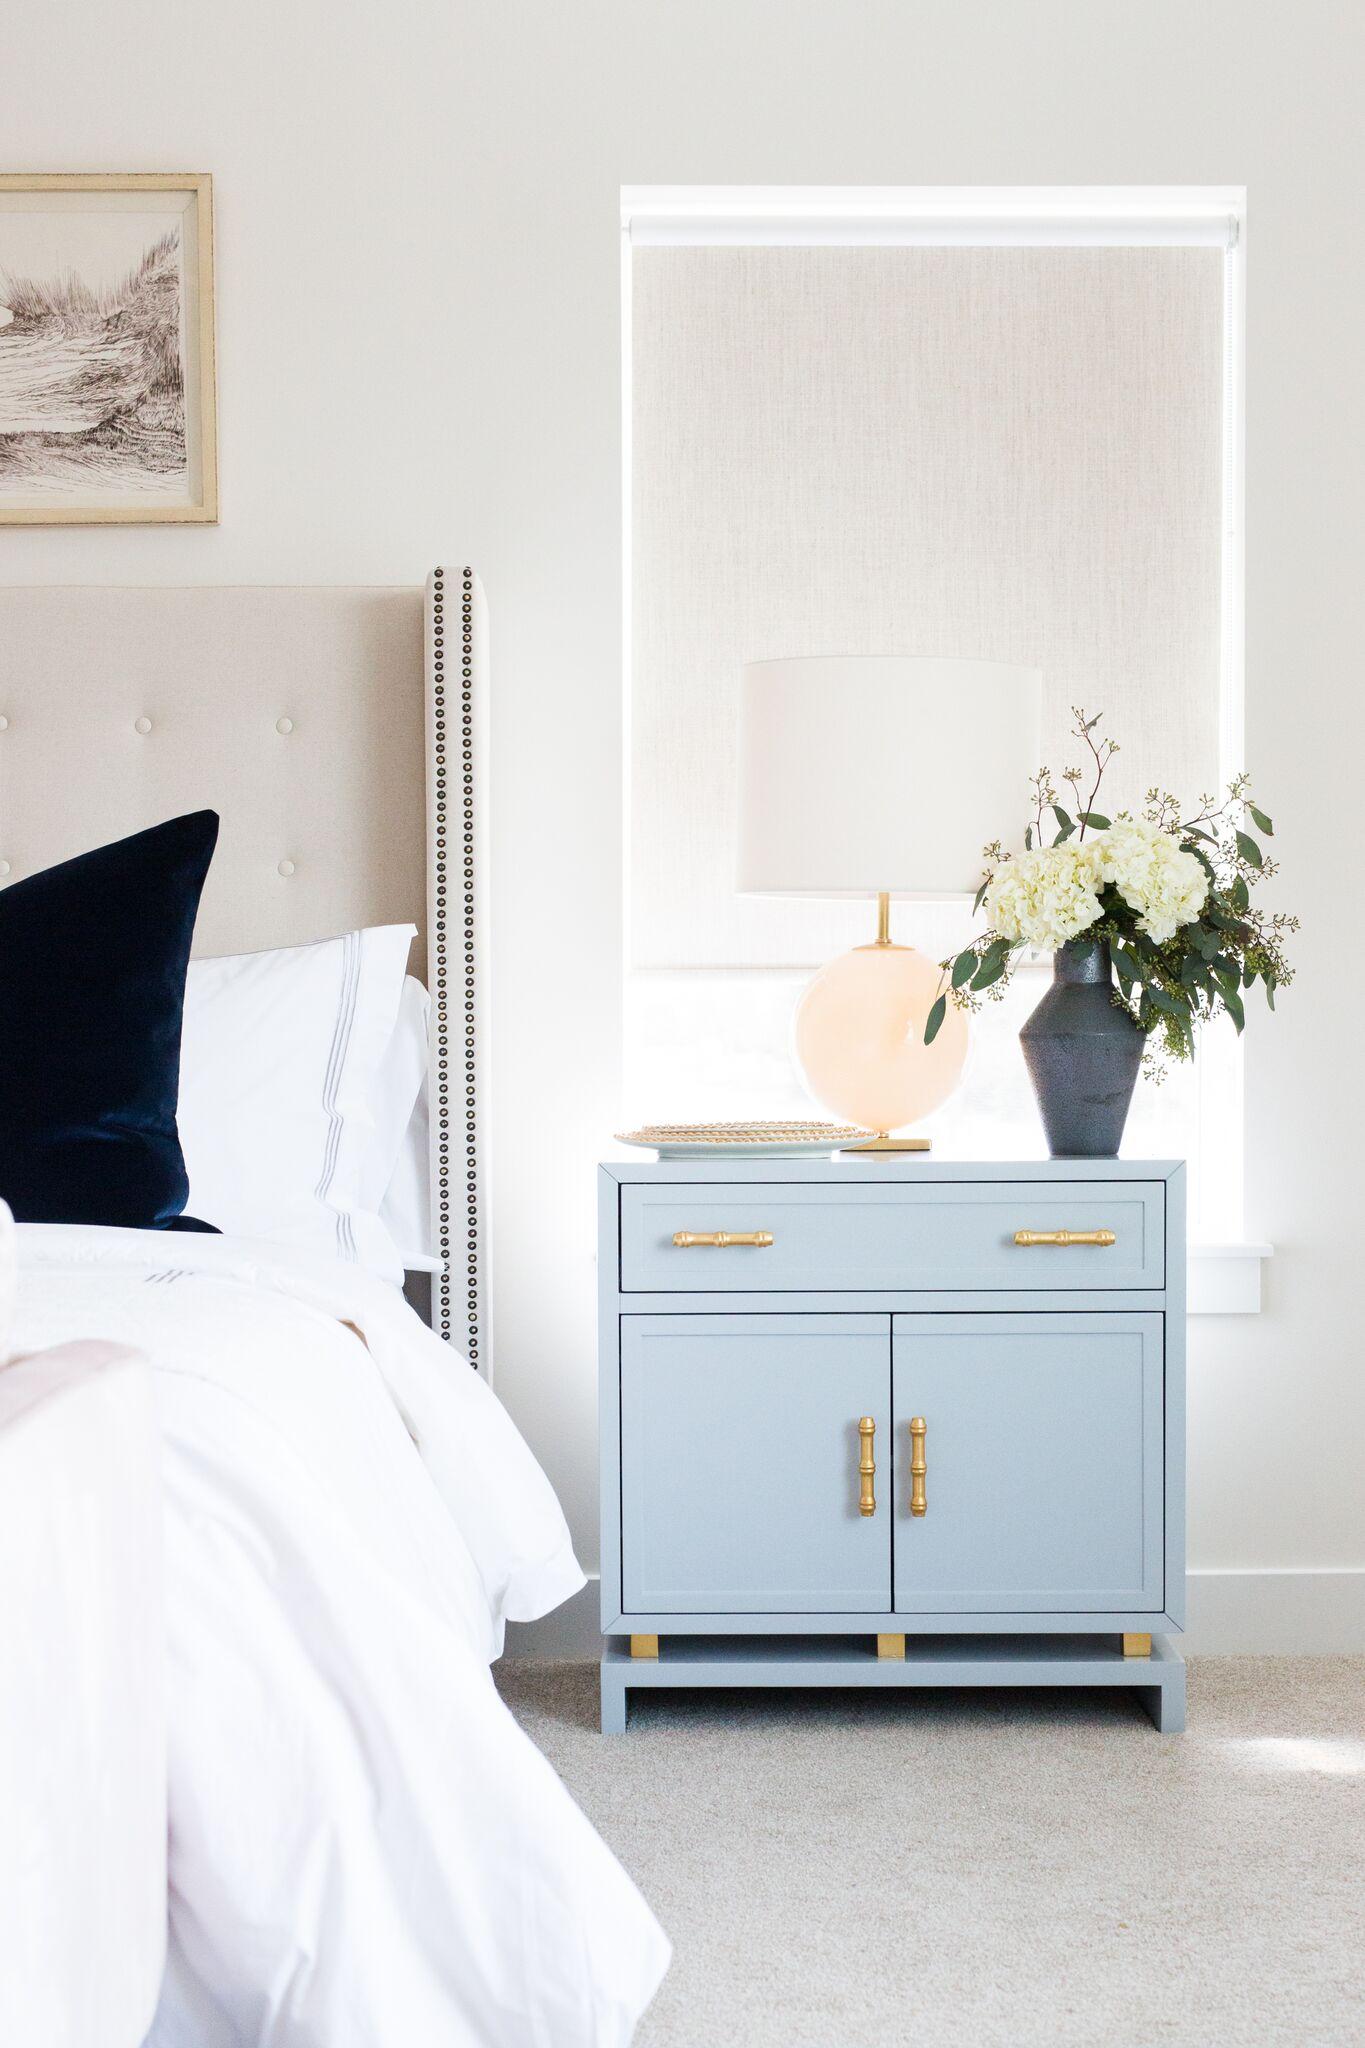 Powder blue nightstand next to white bed